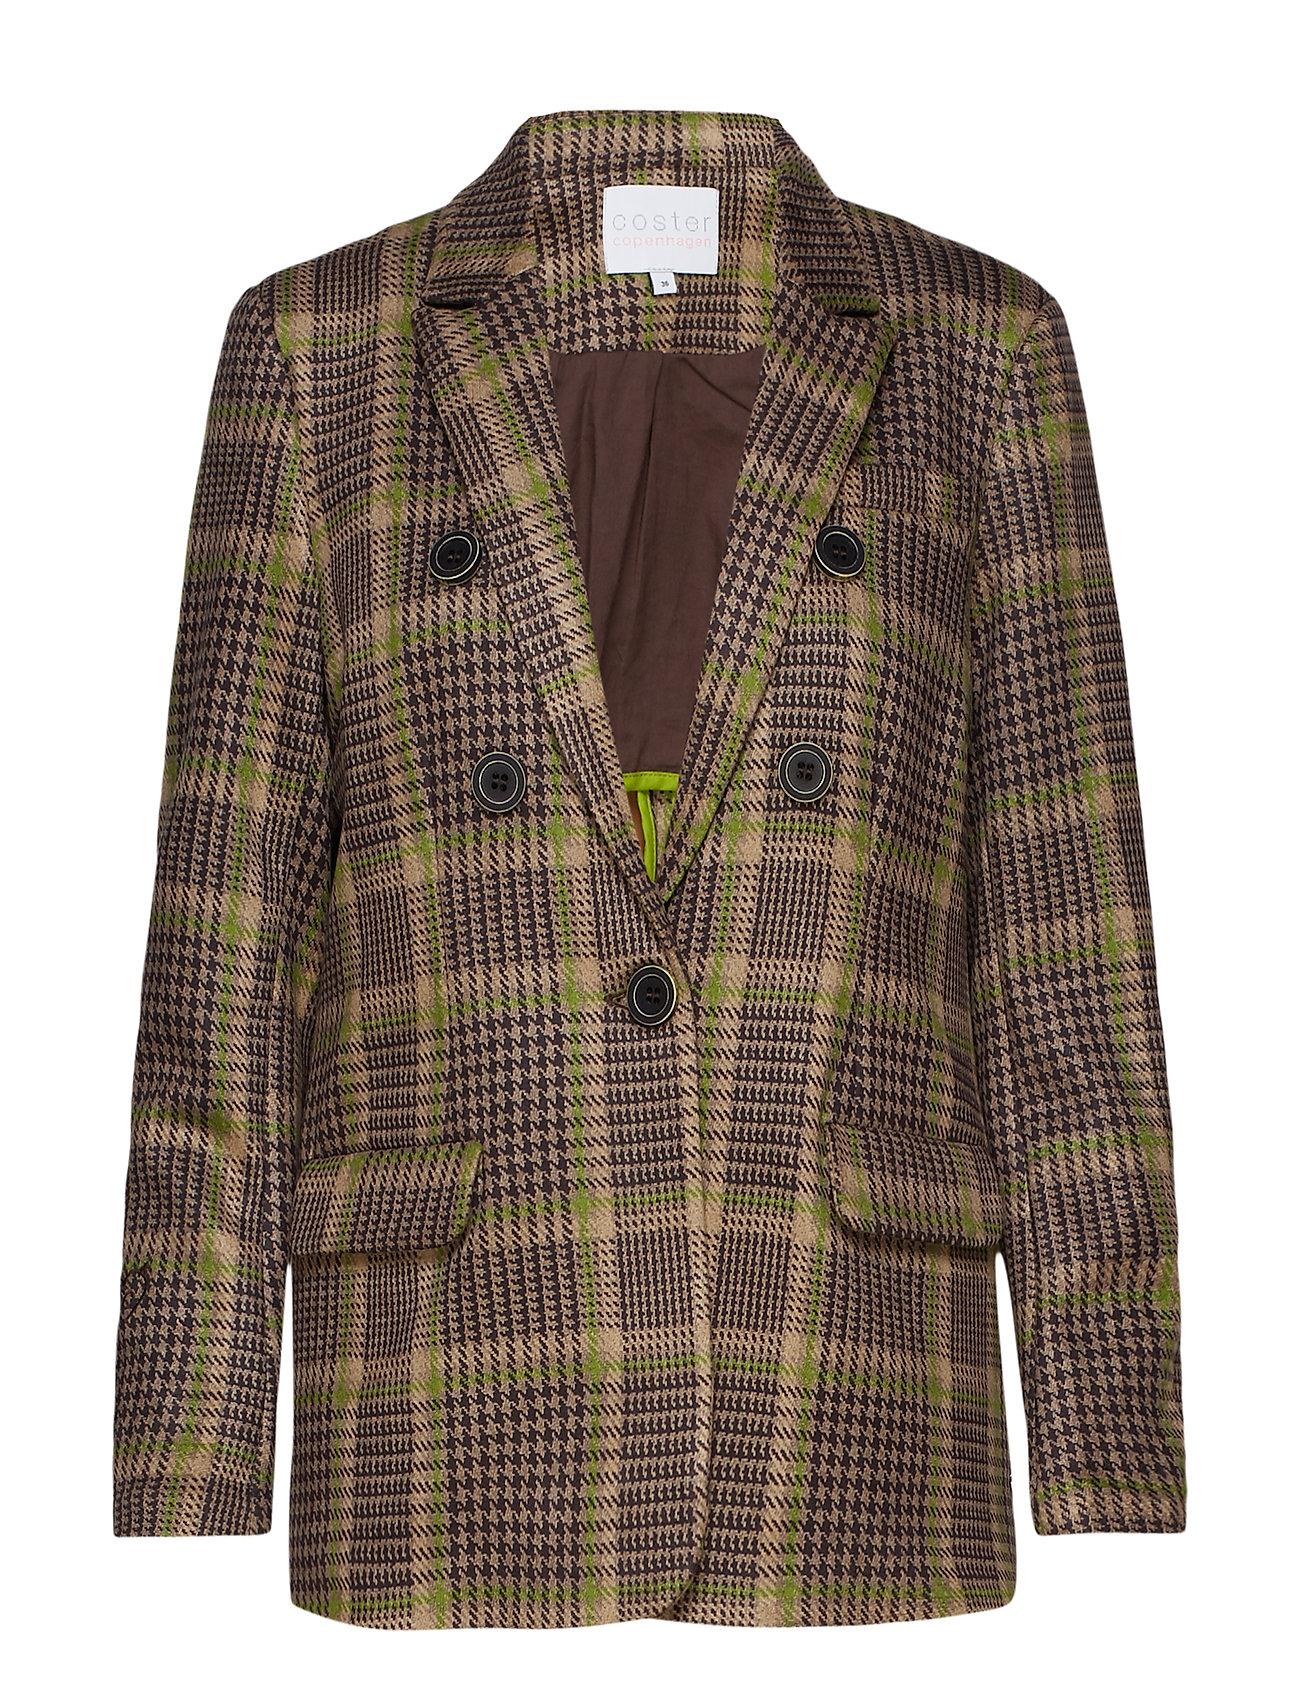 Coster Copenhagen Suit jacket in checked scuba - MOSS CHECK